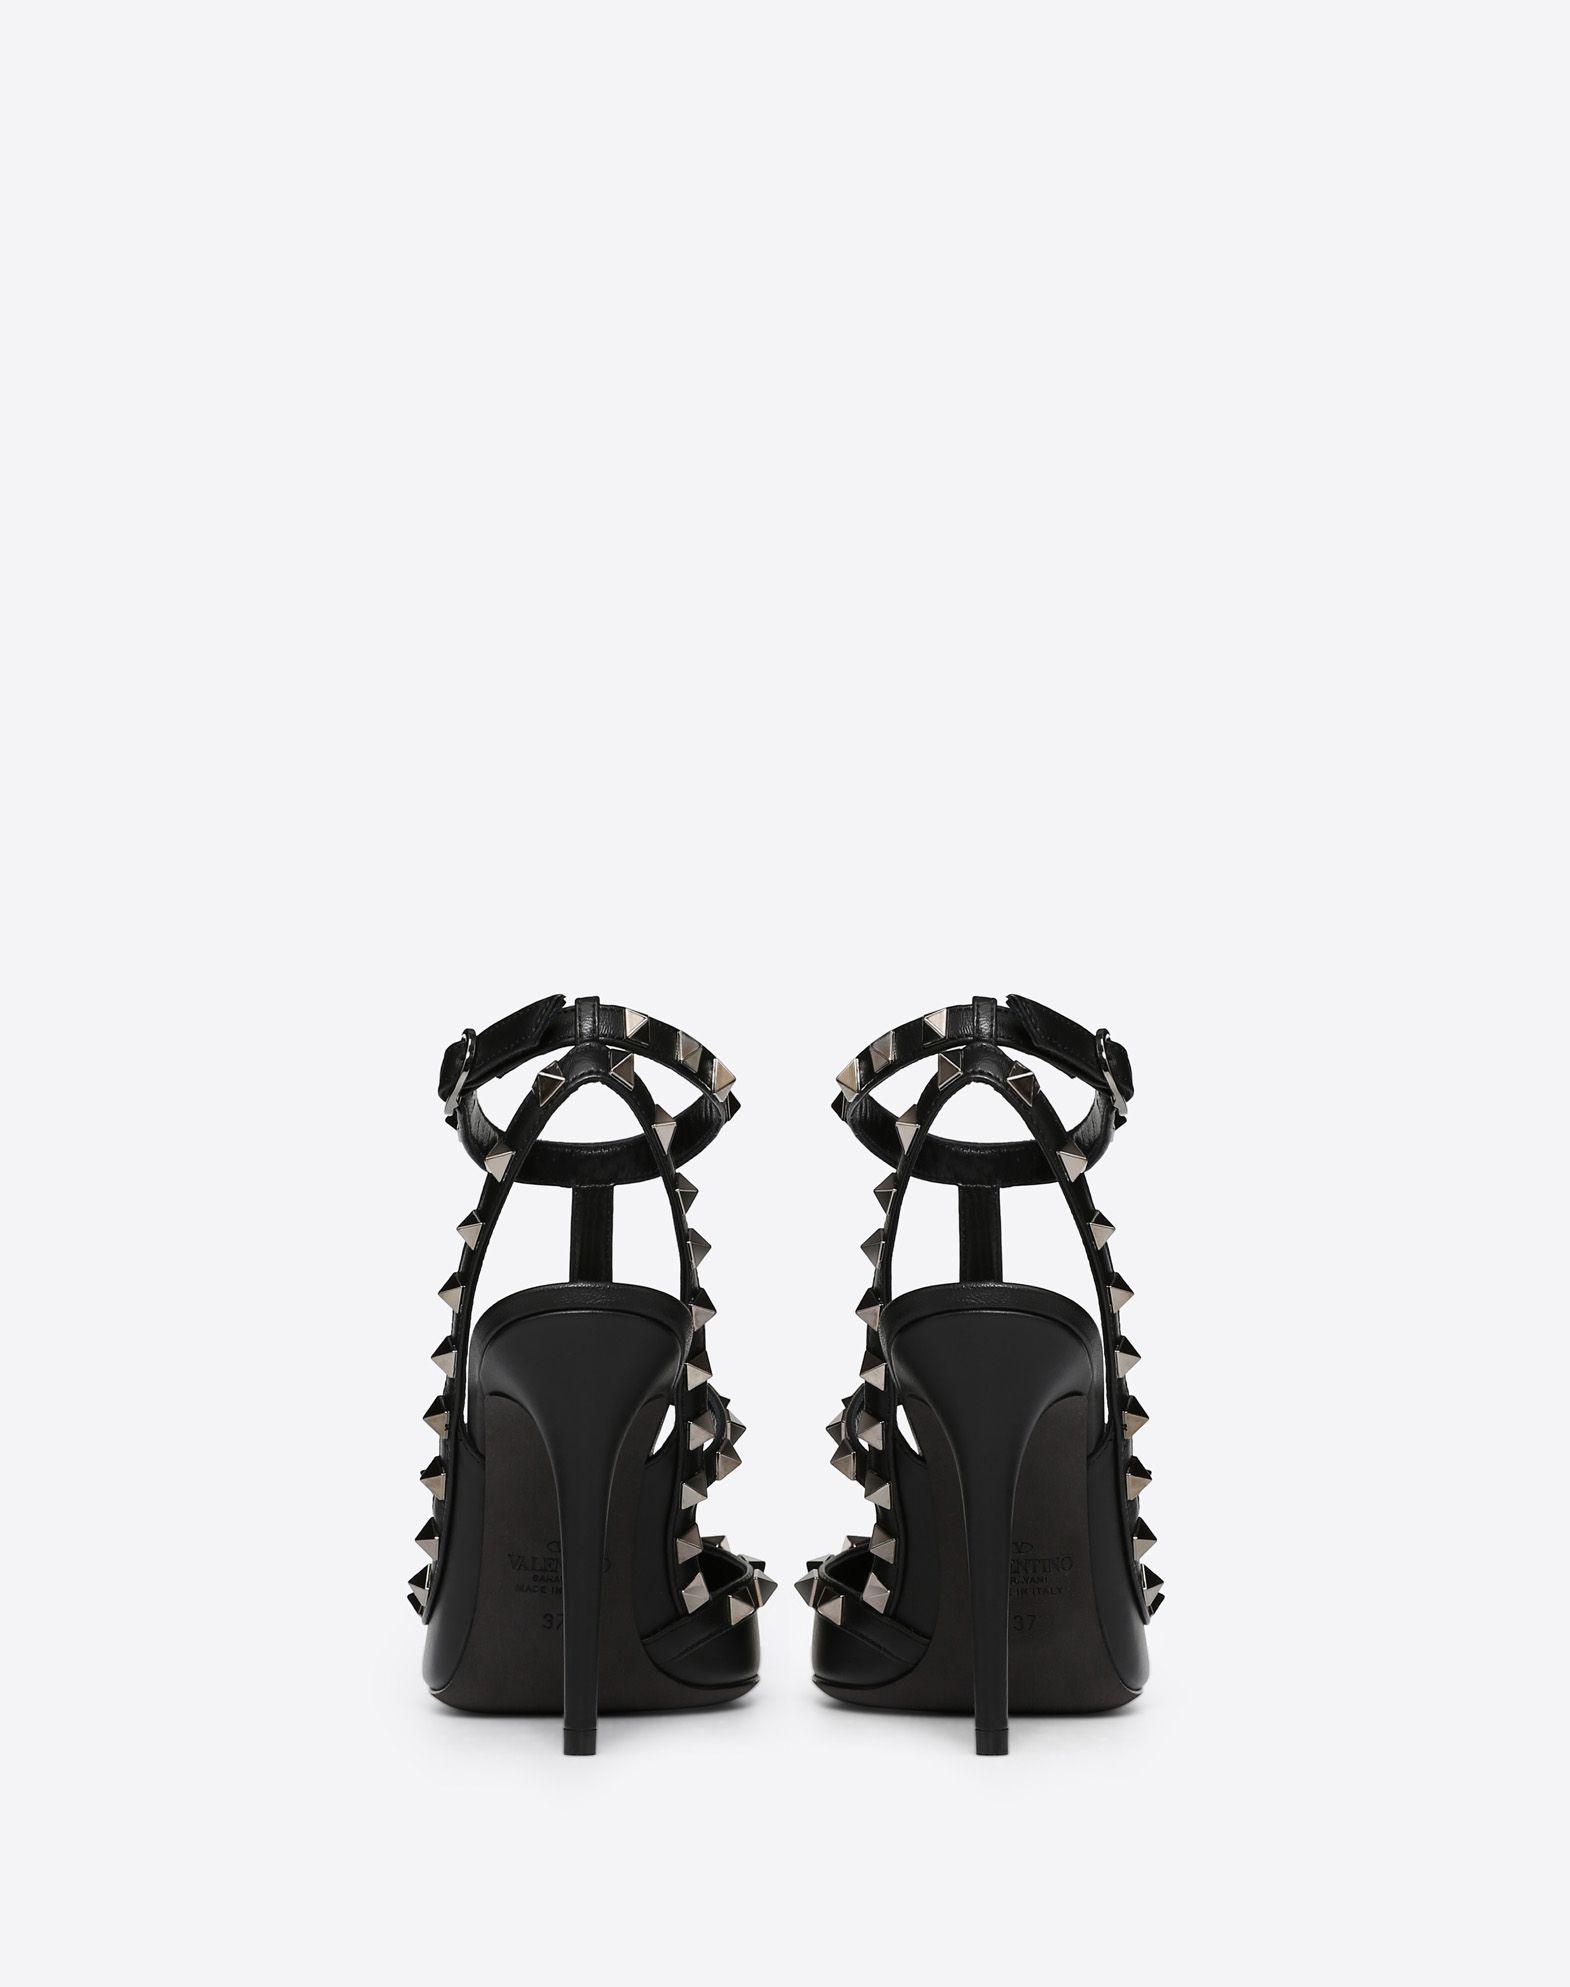 VALENTINO GARAVANI Rockstud Noir Ankle Strap Pump HIGH HEEL PUMPS D d